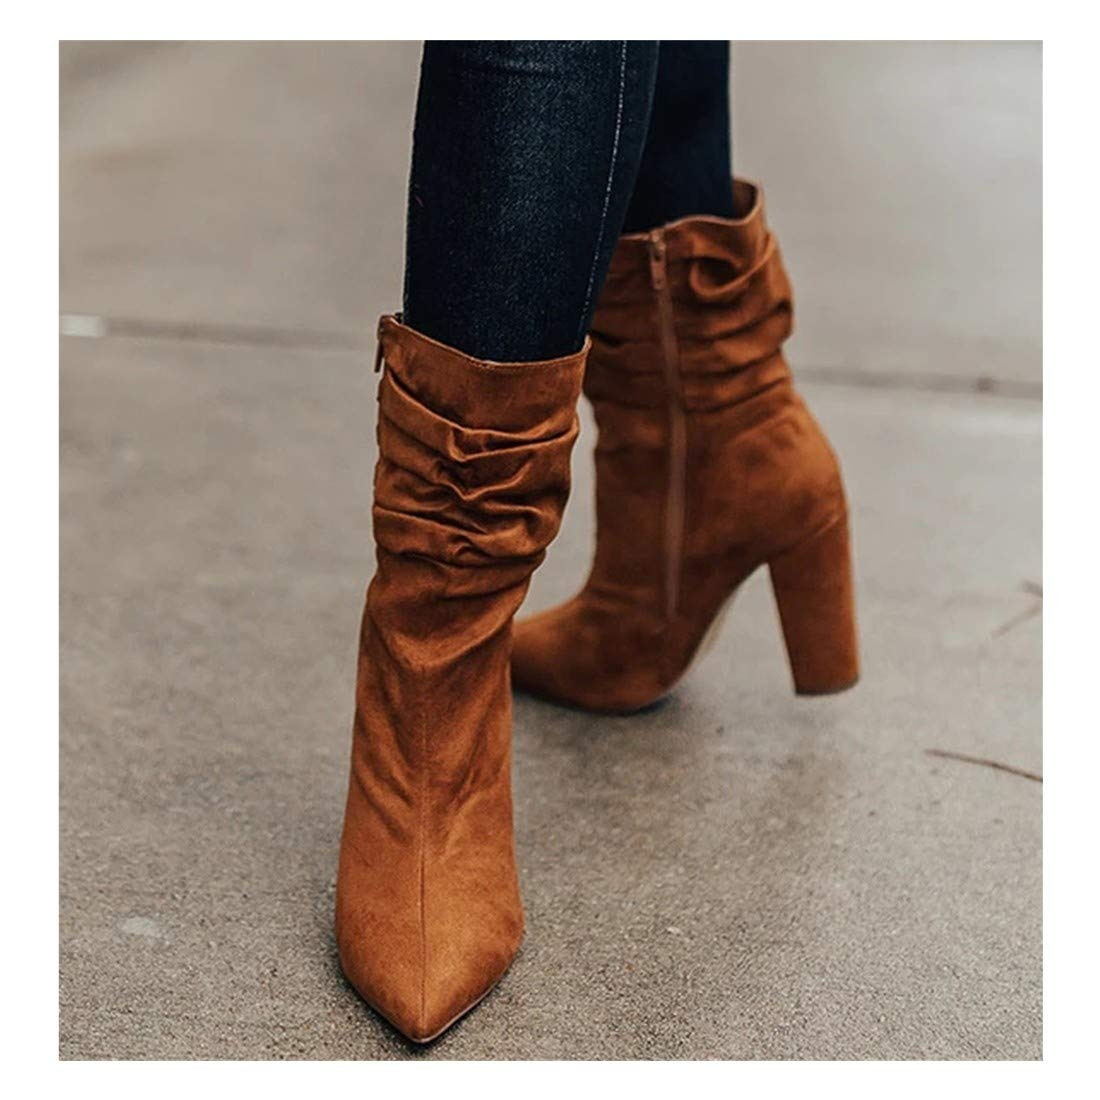 Nihewoo Women High Heel Boots Mid-Calf Boot Shoes Wedge Platform Boot Shoes Ladies Warm Boots Peep Toe Boots Brown by Nihewoo